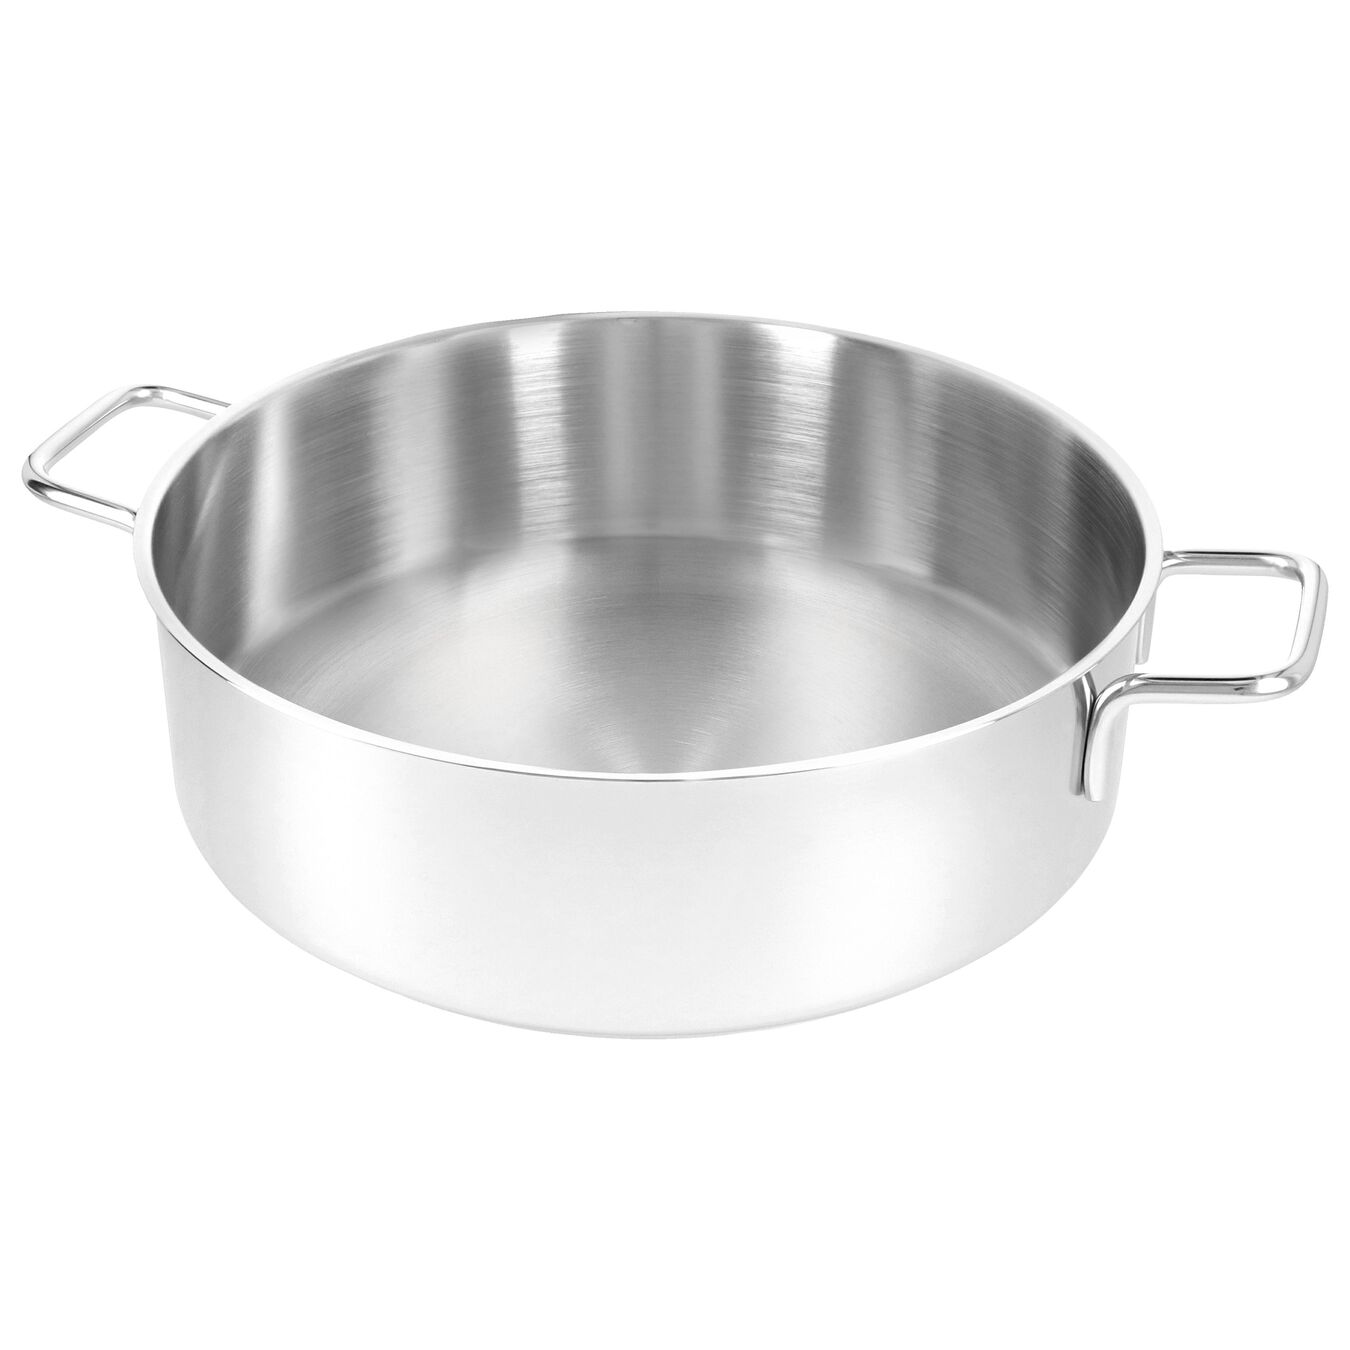 Kookpot met glazen deksel 24 cm / 2,8 l,,large 3